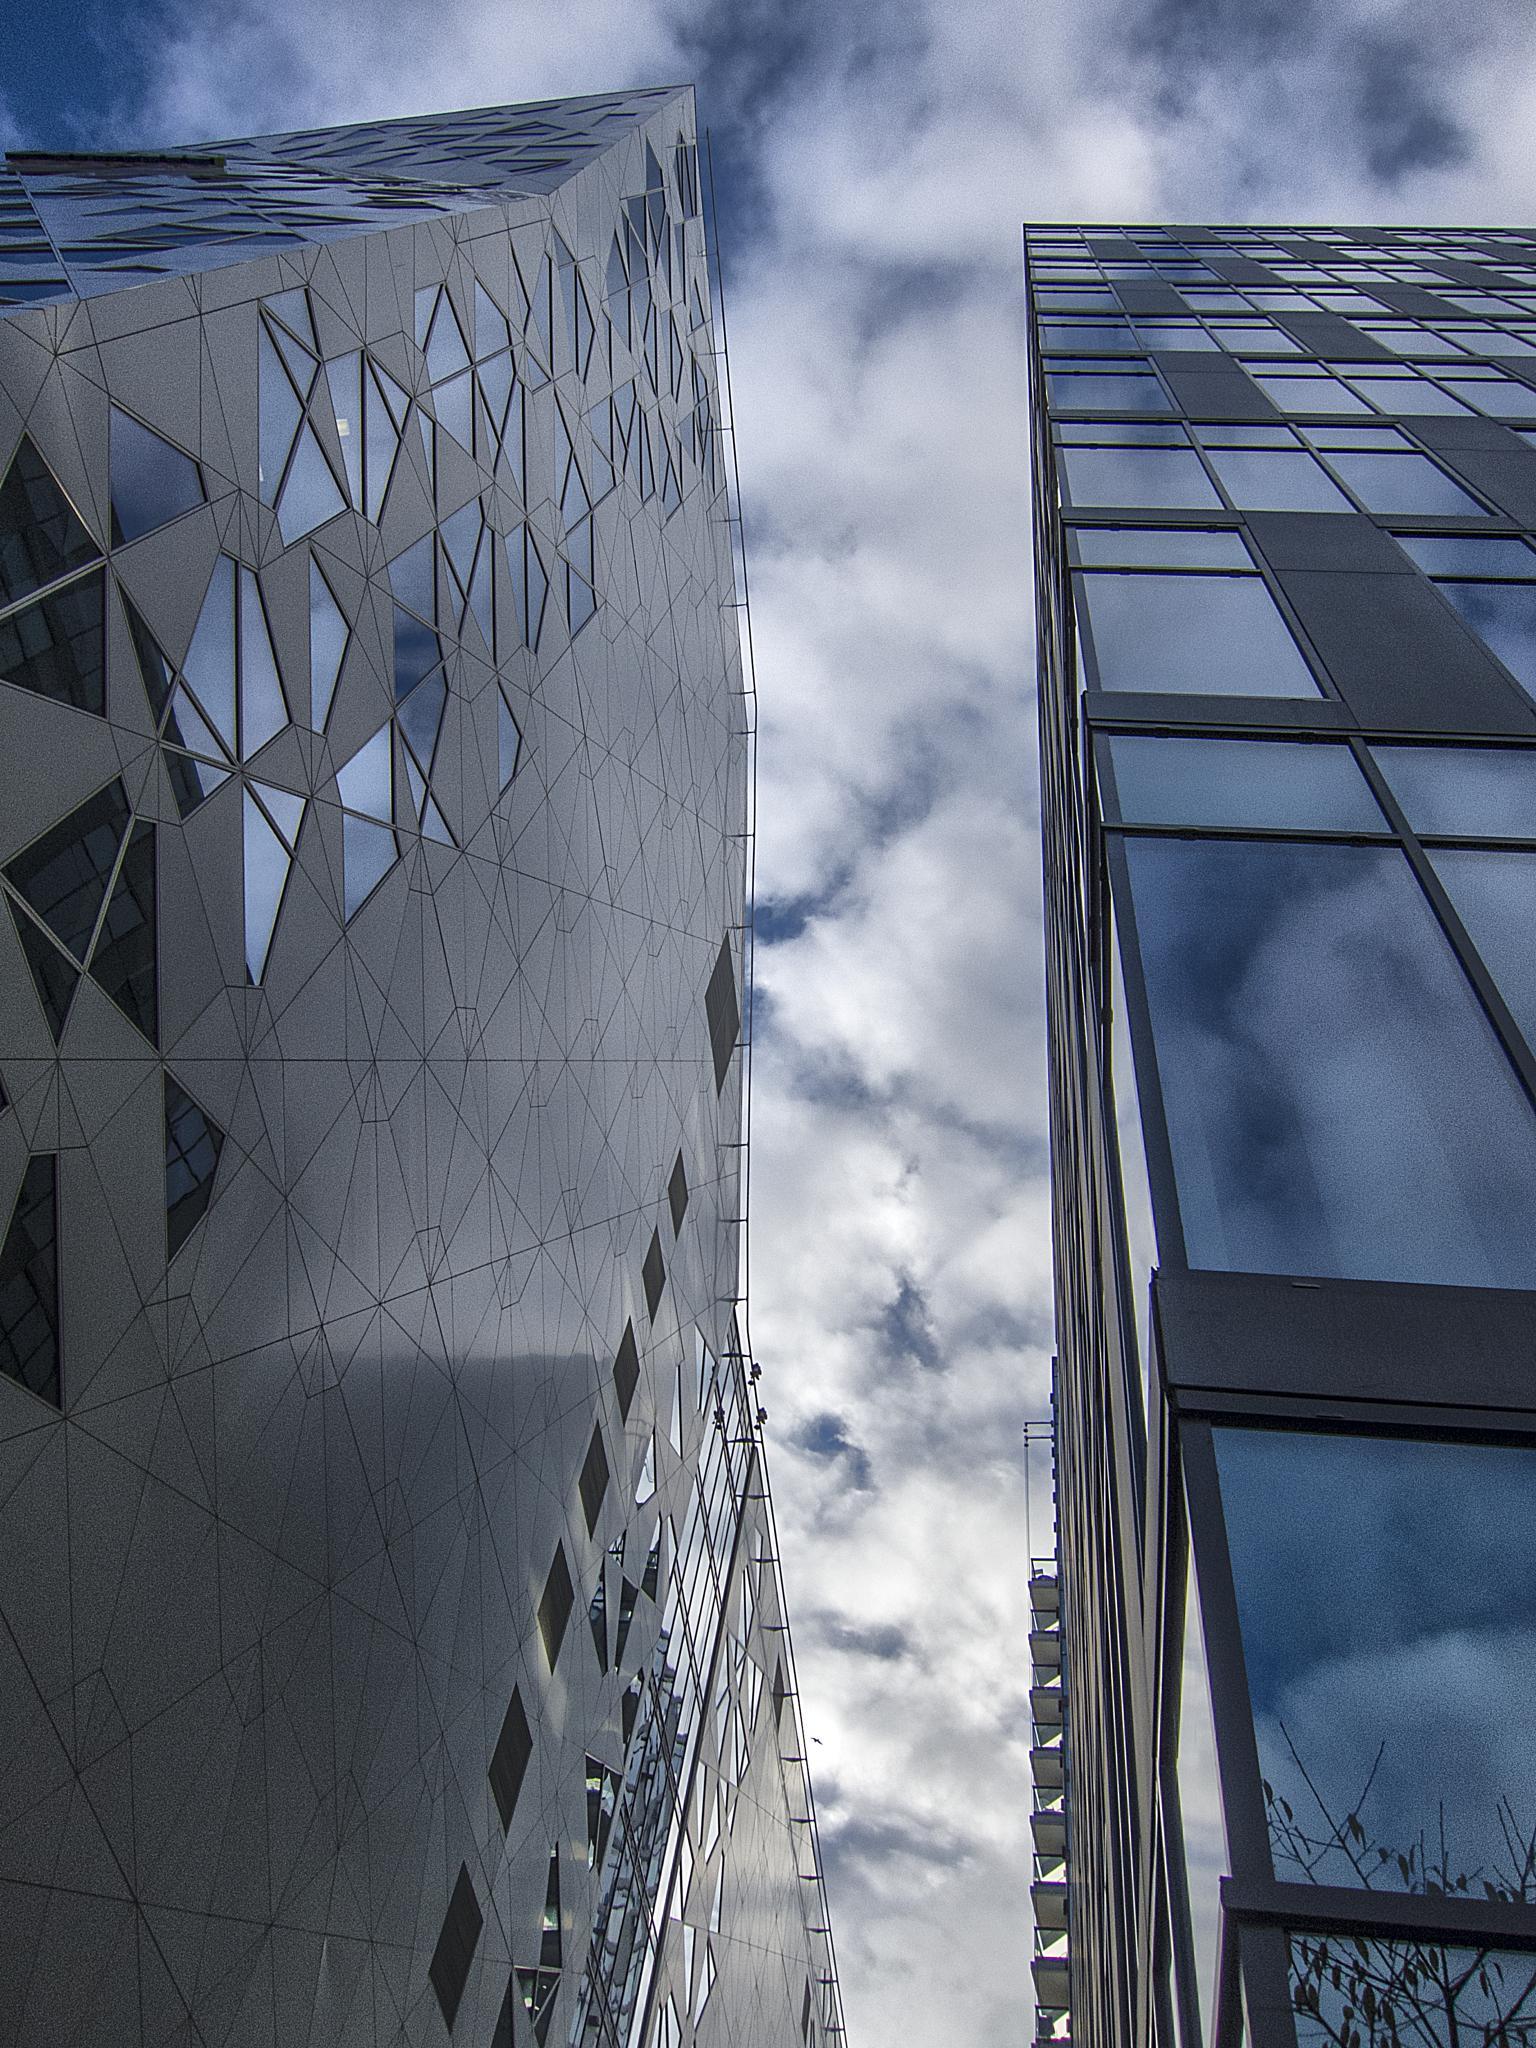 Oslo Skyline ツ by Odd Rune Wang